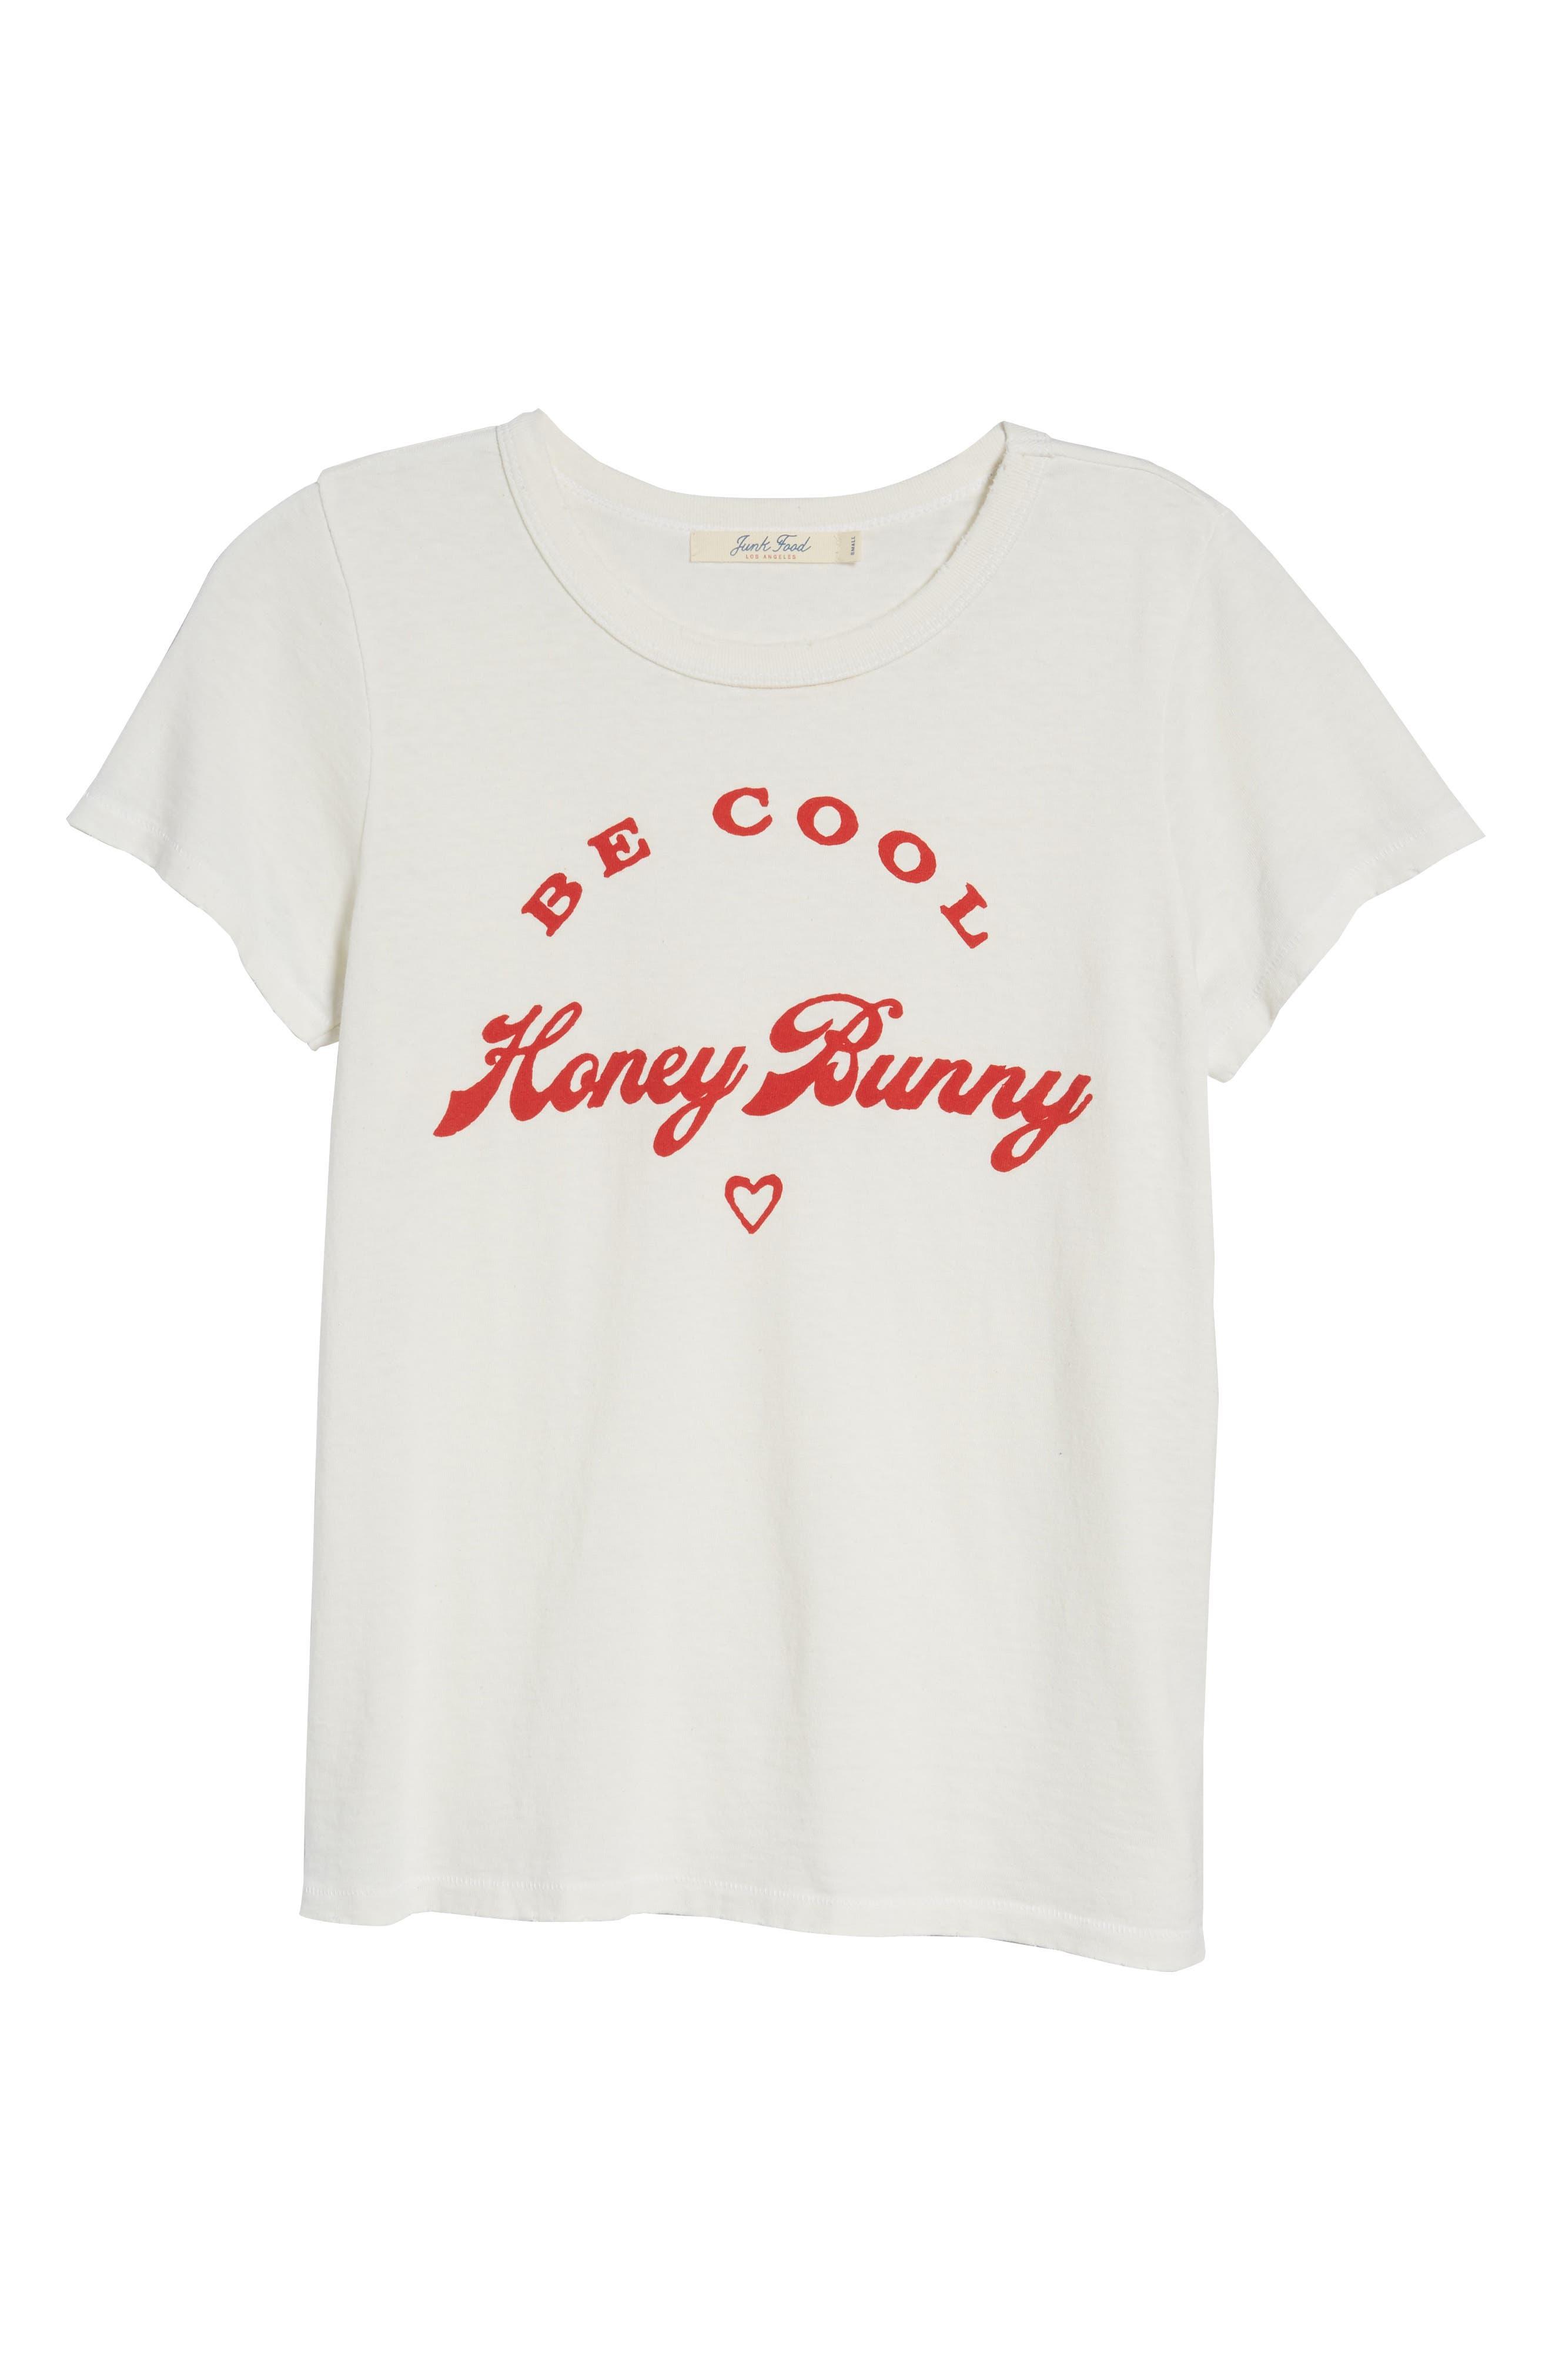 Honey Bunny Tee,                             Alternate thumbnail 7, color,                             110